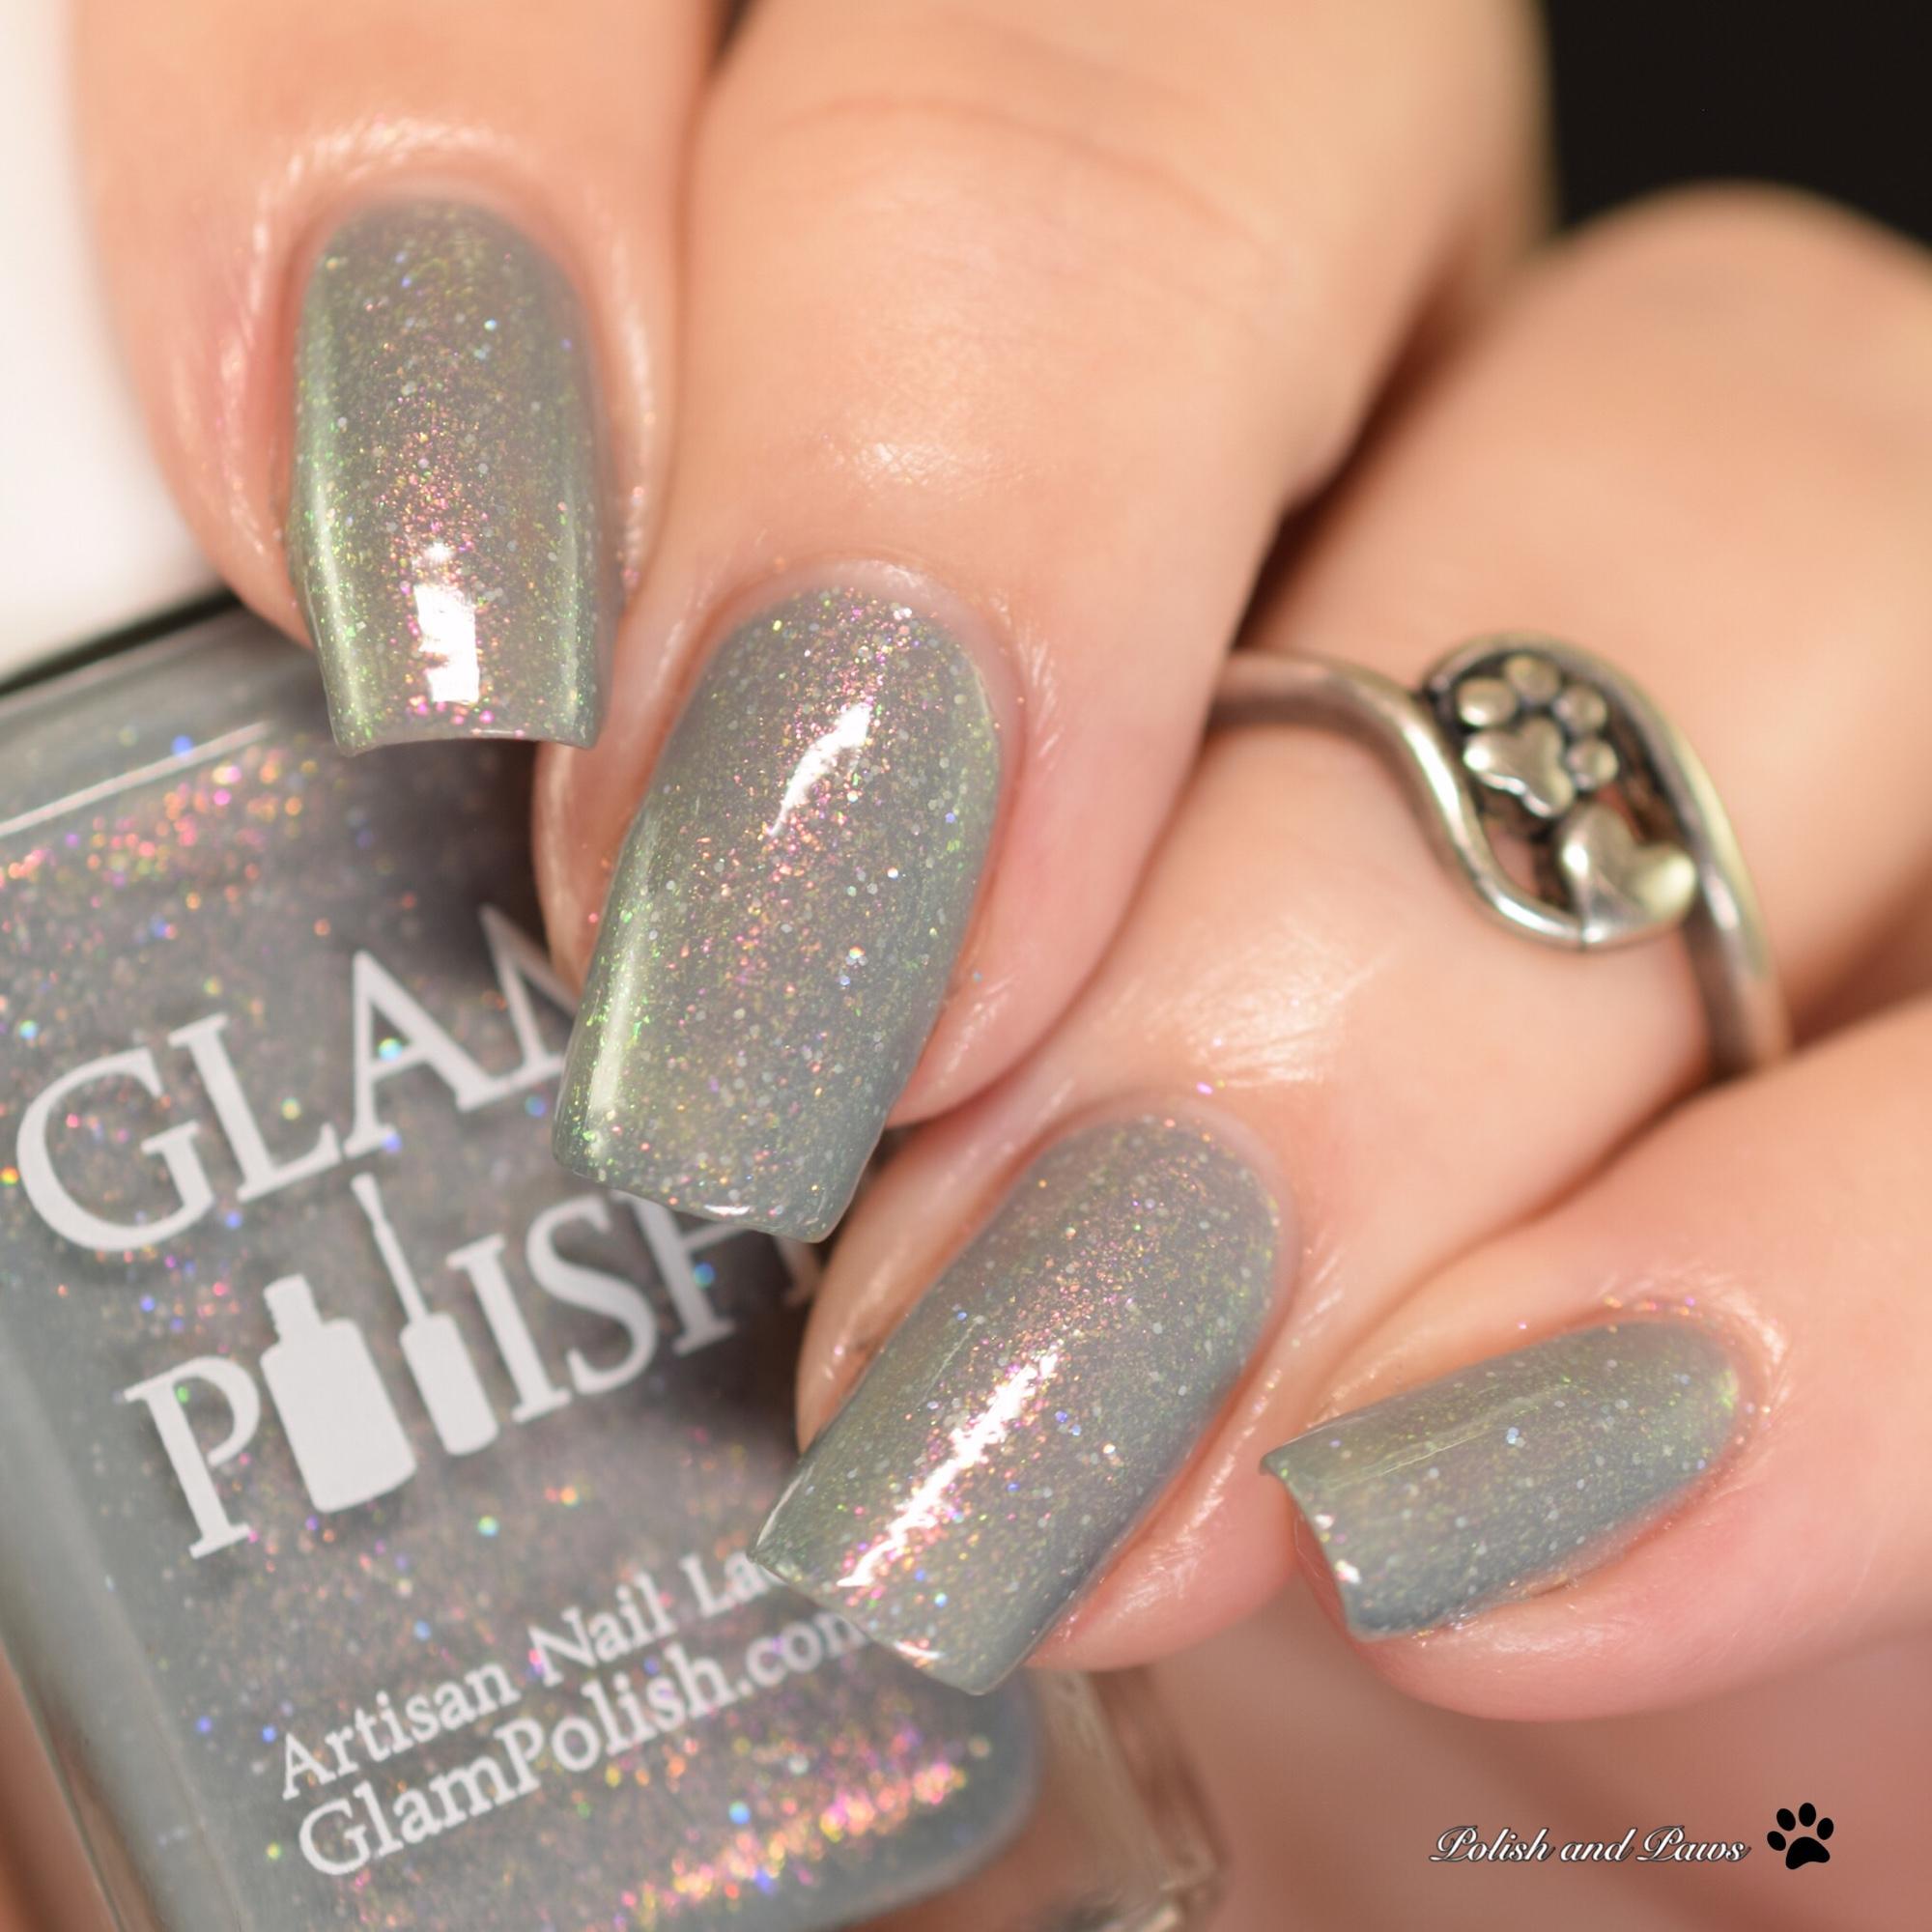 Glam Polish Cloud City